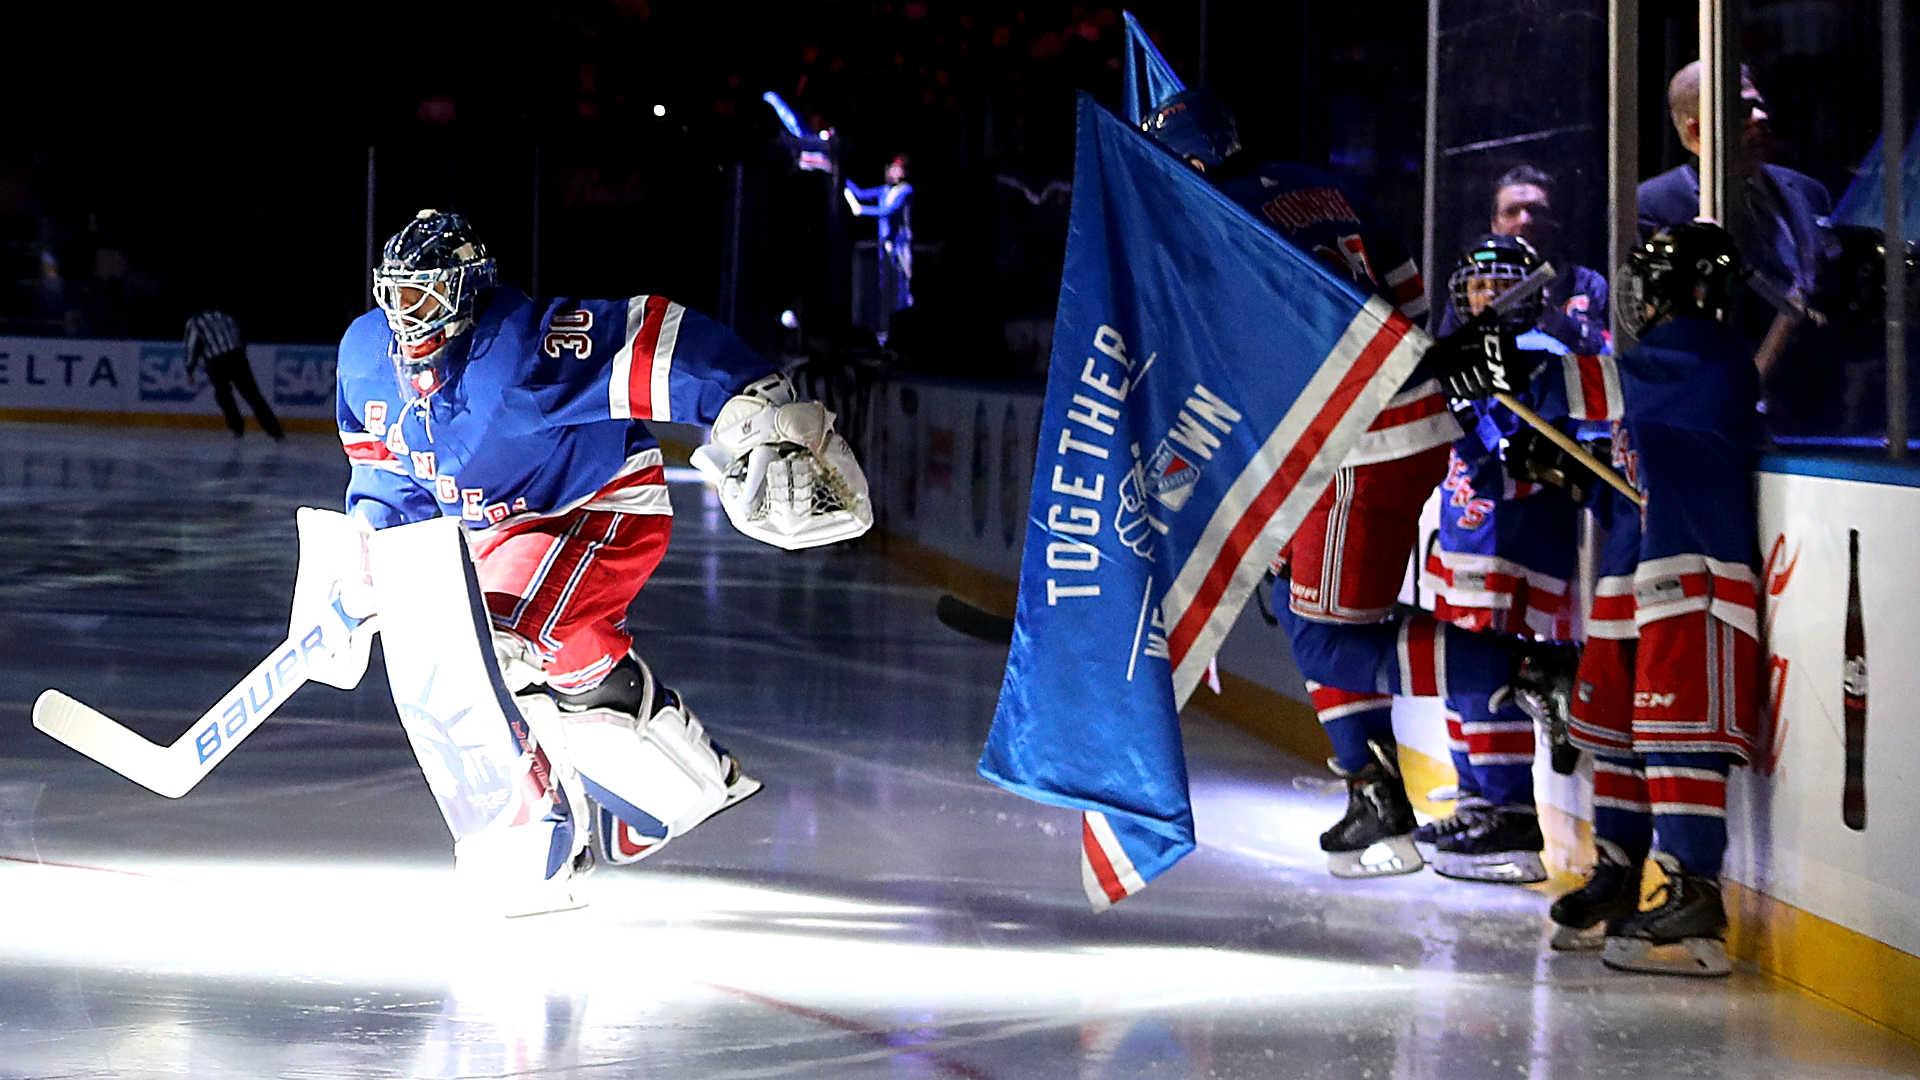 Ex-Rangers goalies reflect on Henrik Lundqvist's tenure in New York: 'He was a rock star' 1